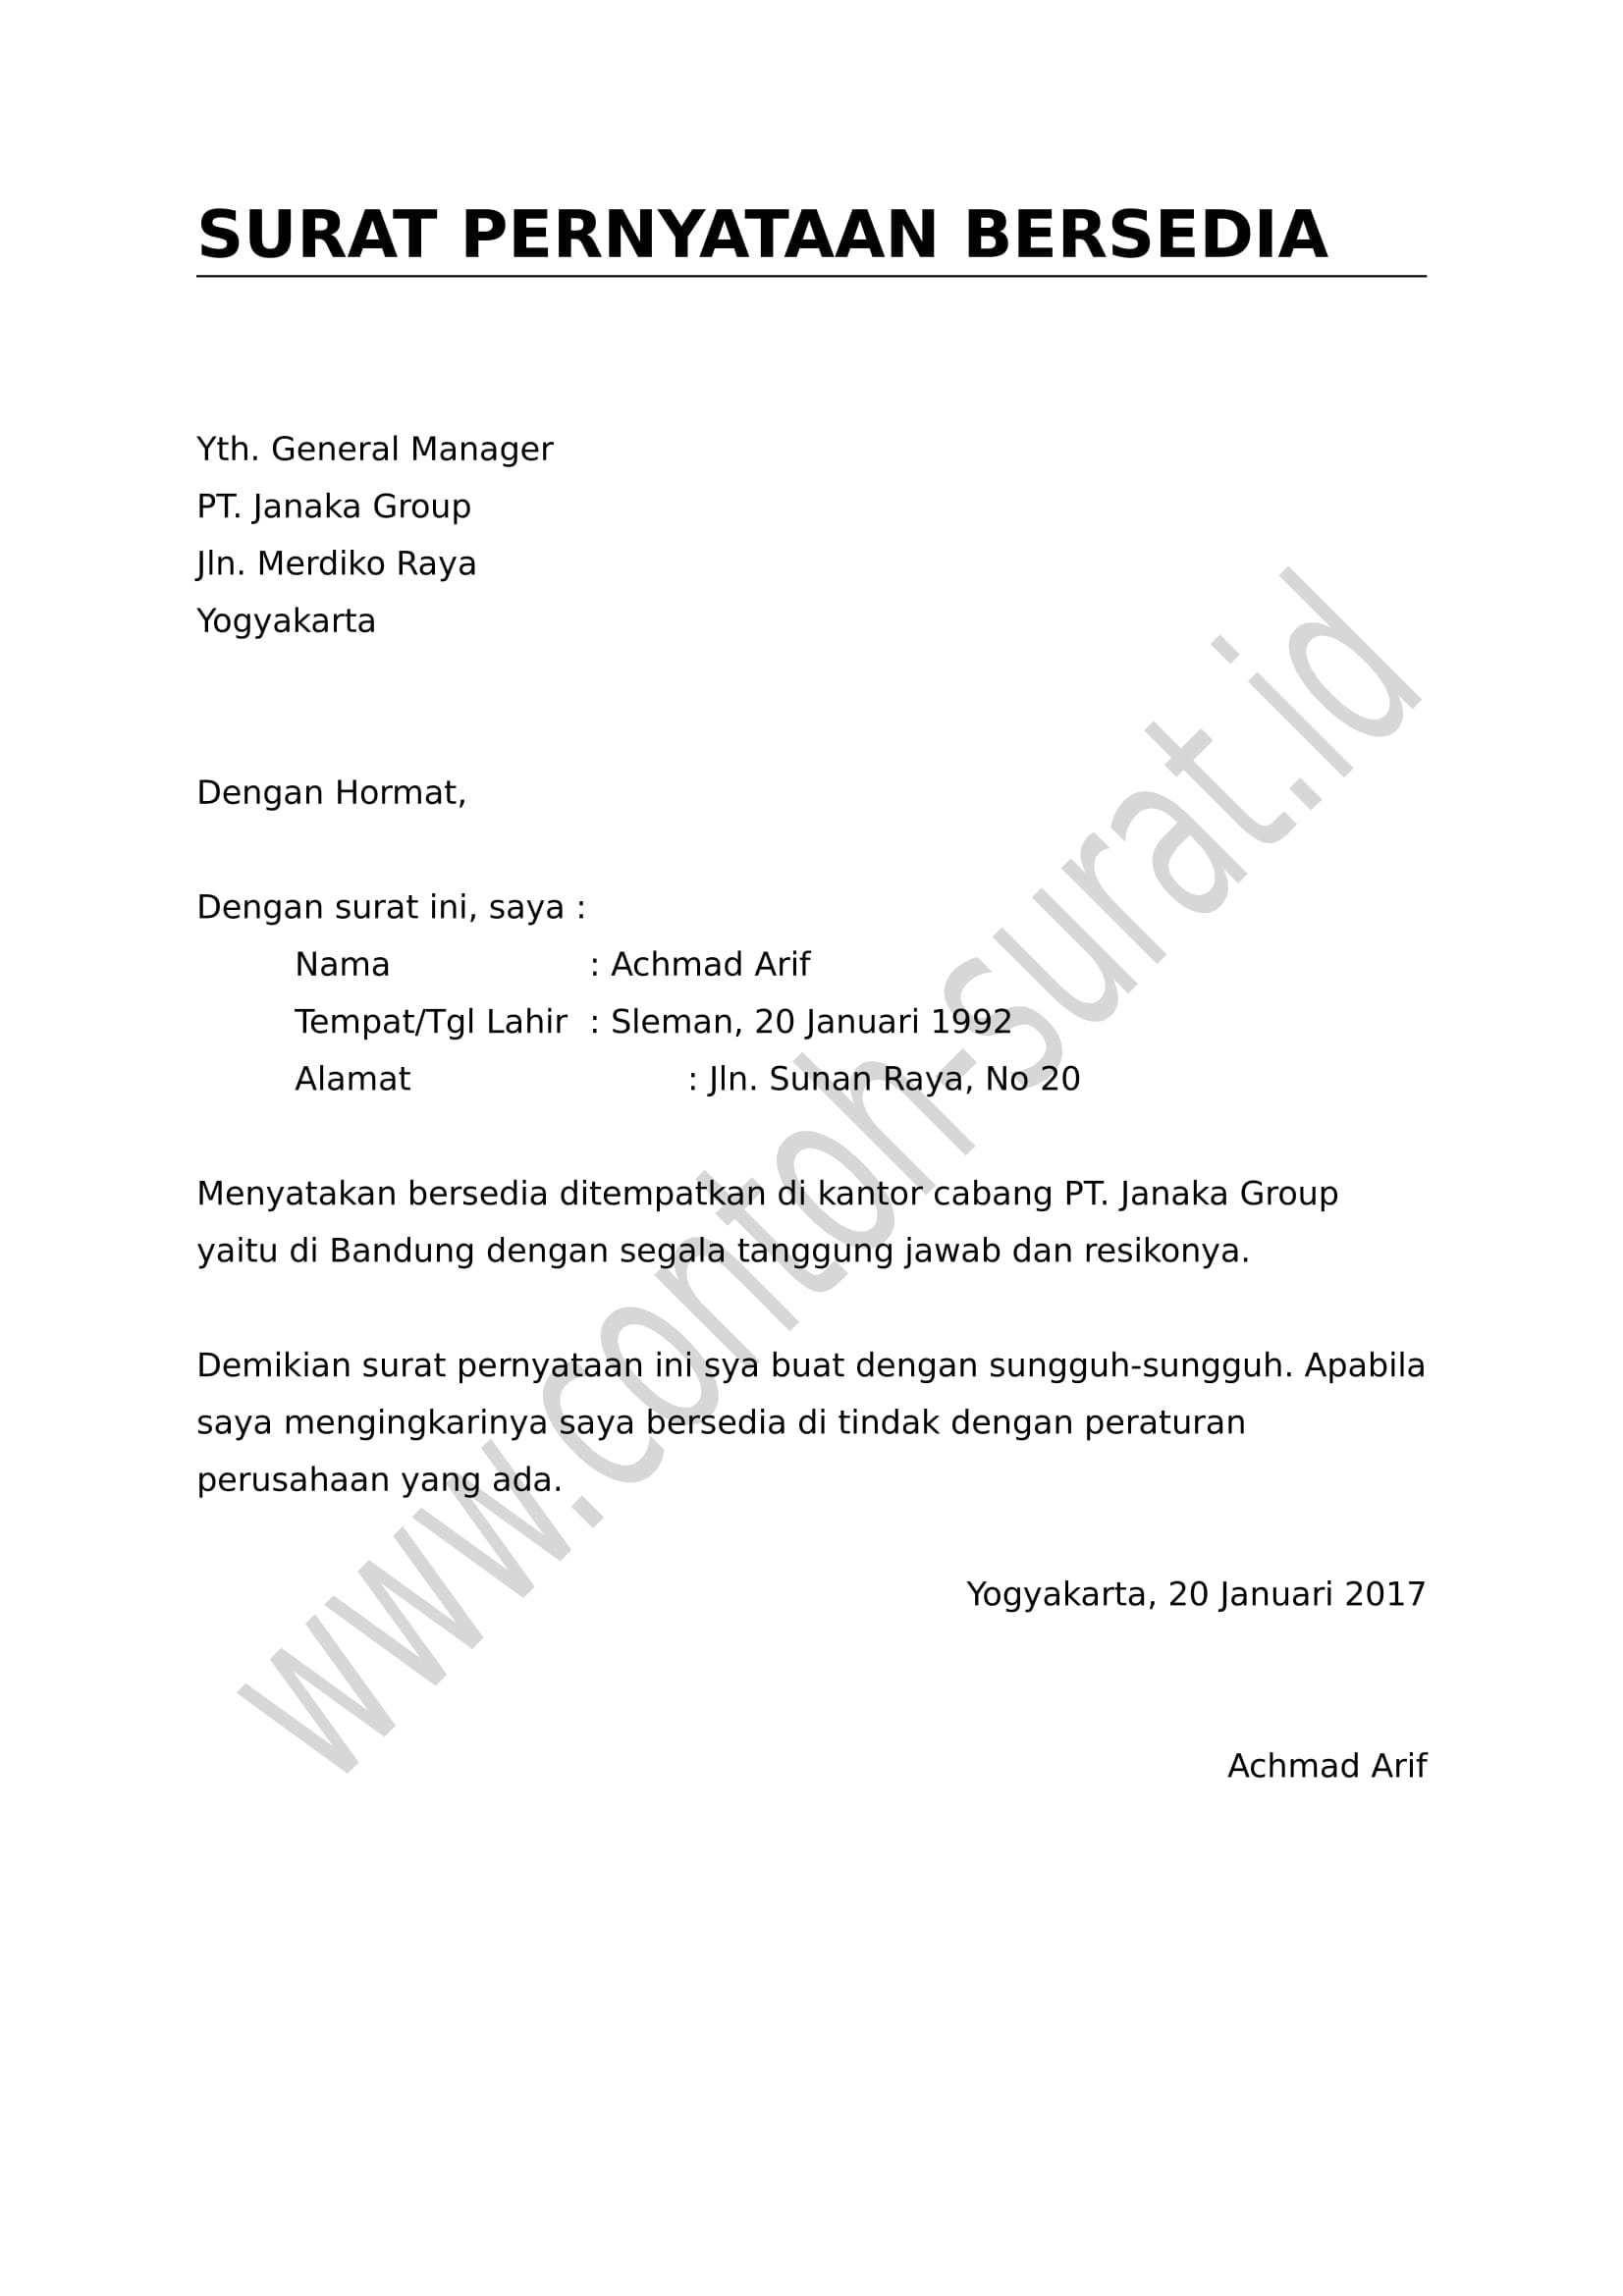 Contoh Surat Perjanjian Tulis Tangan Surat Tulisan Tulisan Tangan